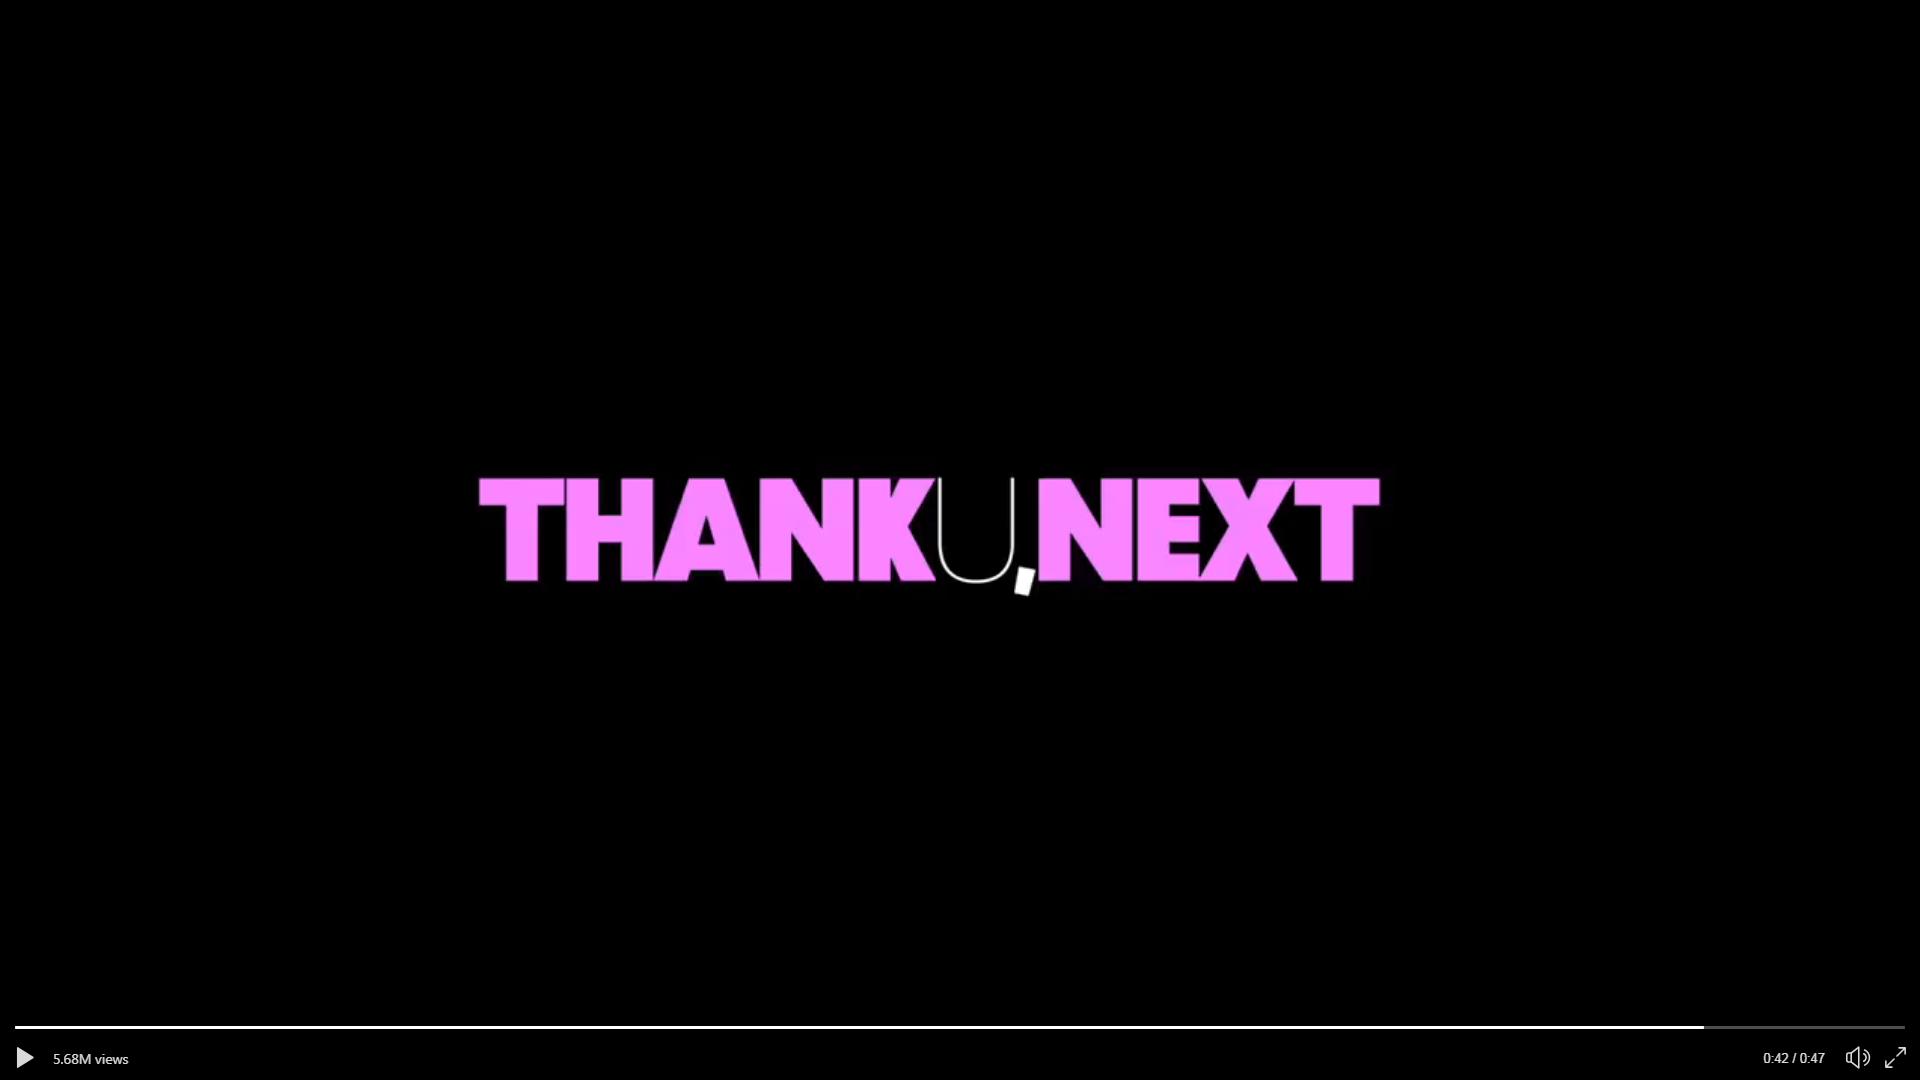 Ariana Grande Teases Her Thank U Next Music Video B93 Fm